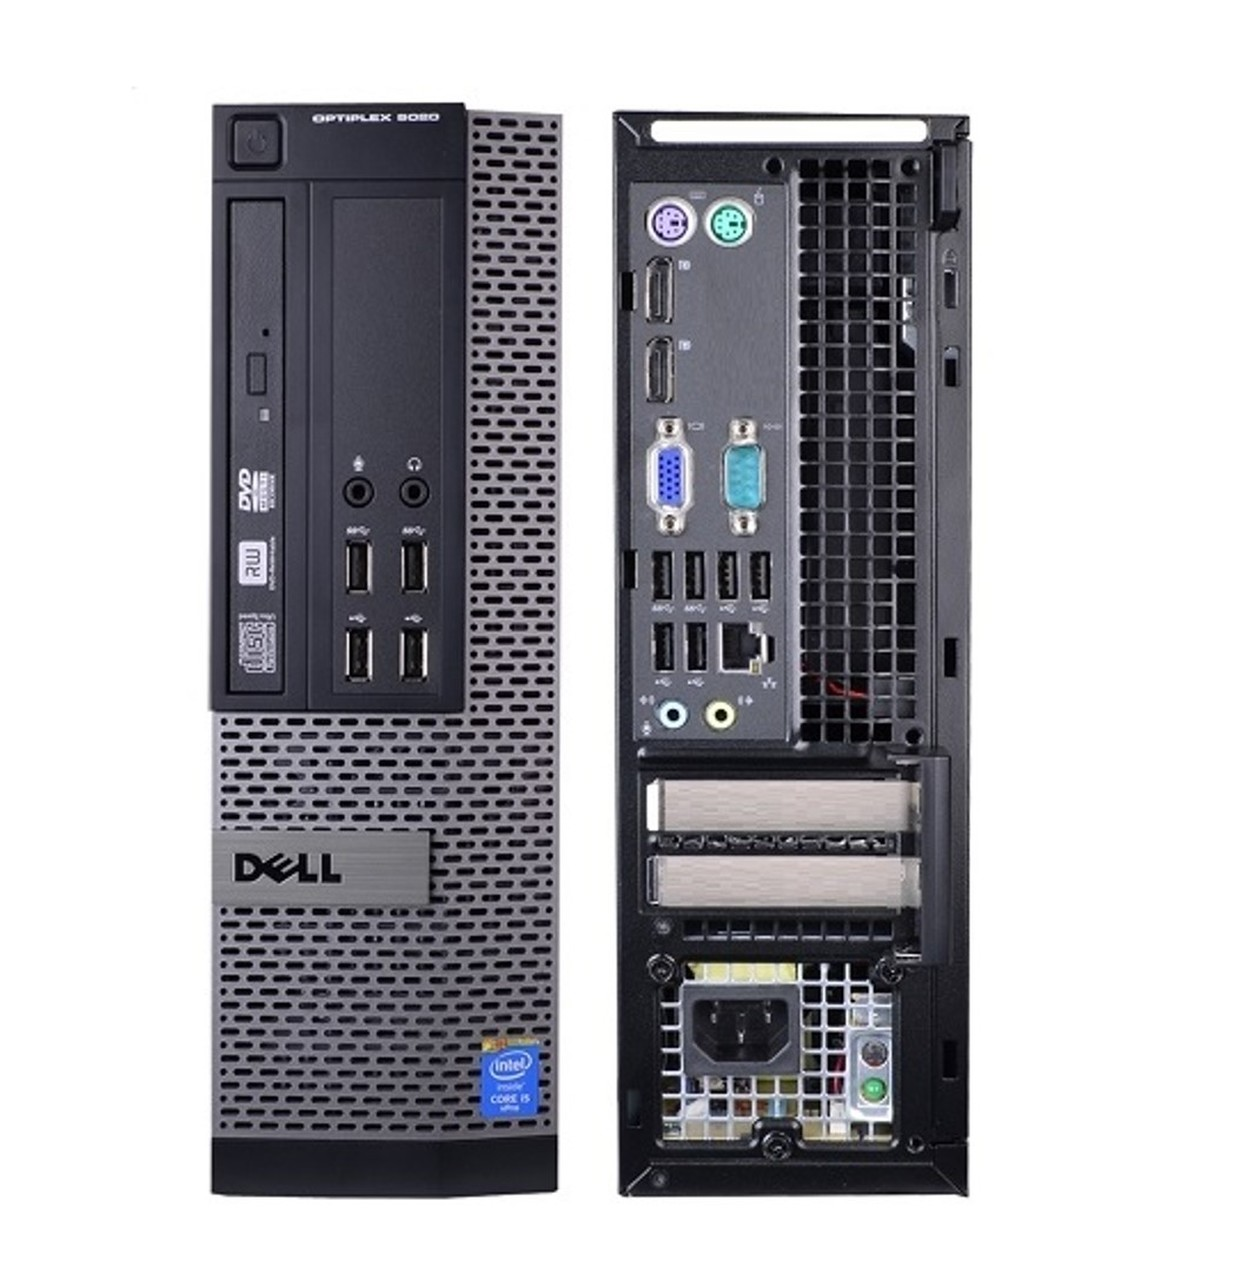 DELL OPT 9020 SFF 08 68774.1556234053 11 - Oliver Computer Store